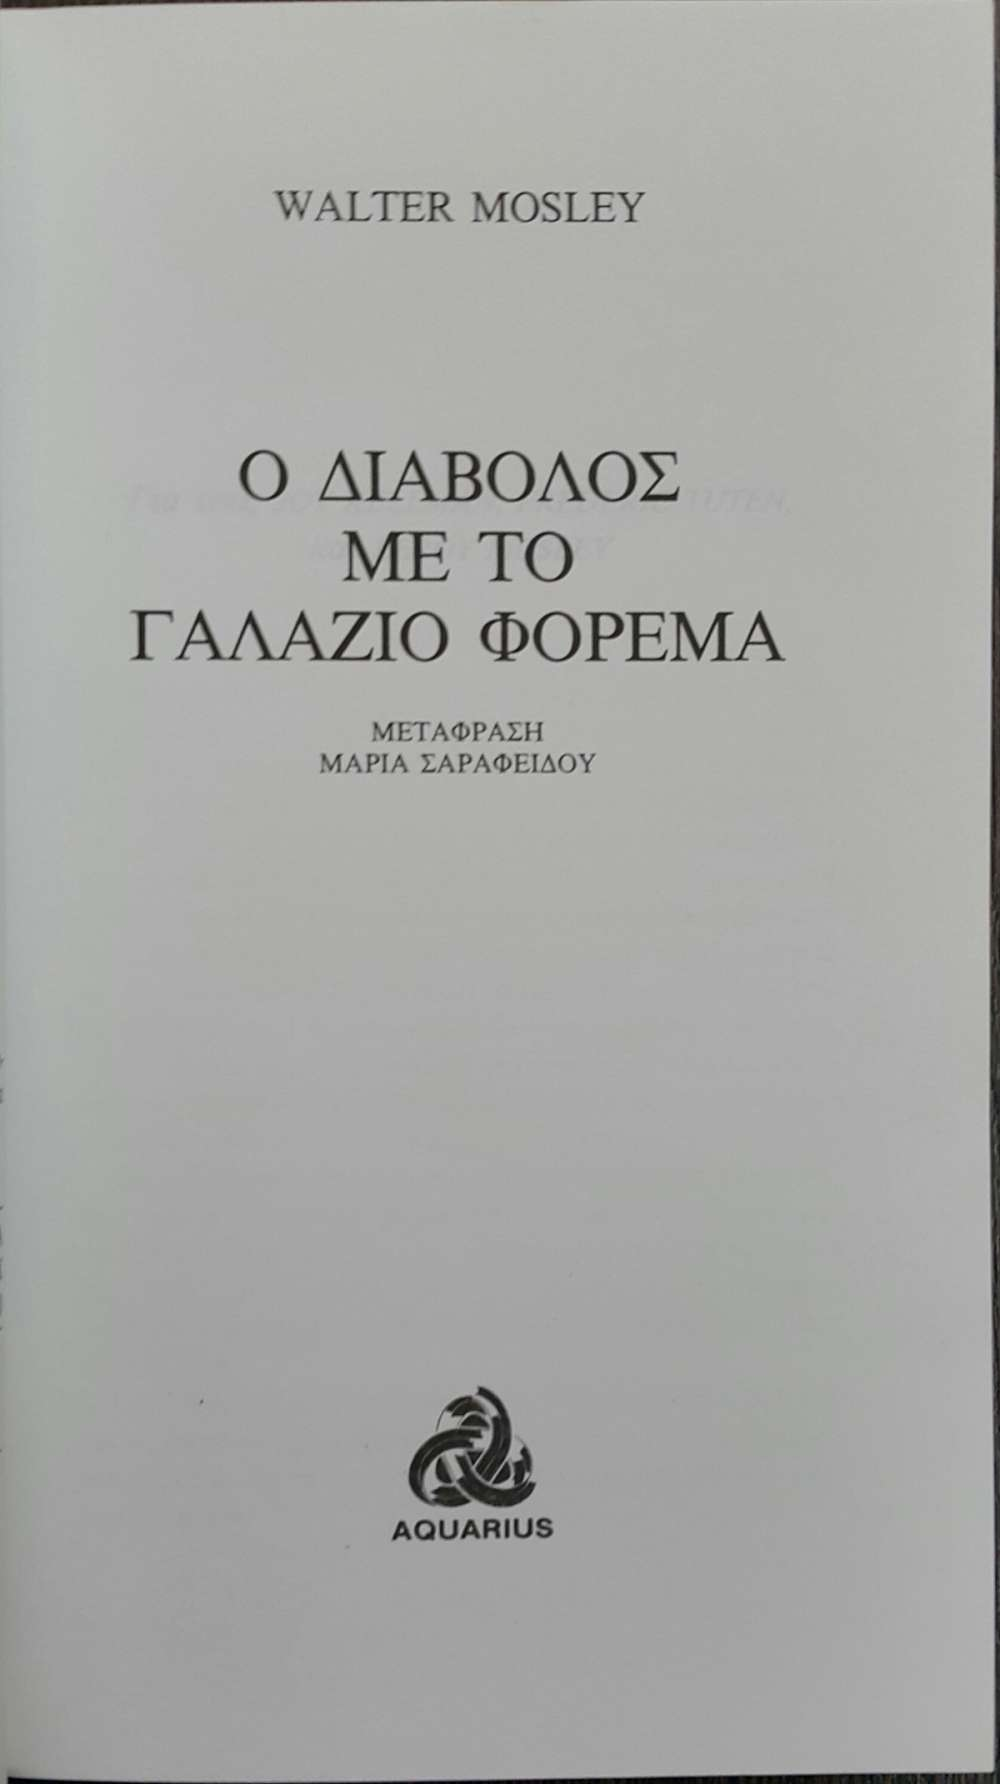 34d47bc03a00 Ο ΔΙΑΒΟΛΟΣ ΜΕ ΤΟ ΓΑΛΑΖΙΟ ΦΟΡΕΜΑ - πίξελbooks